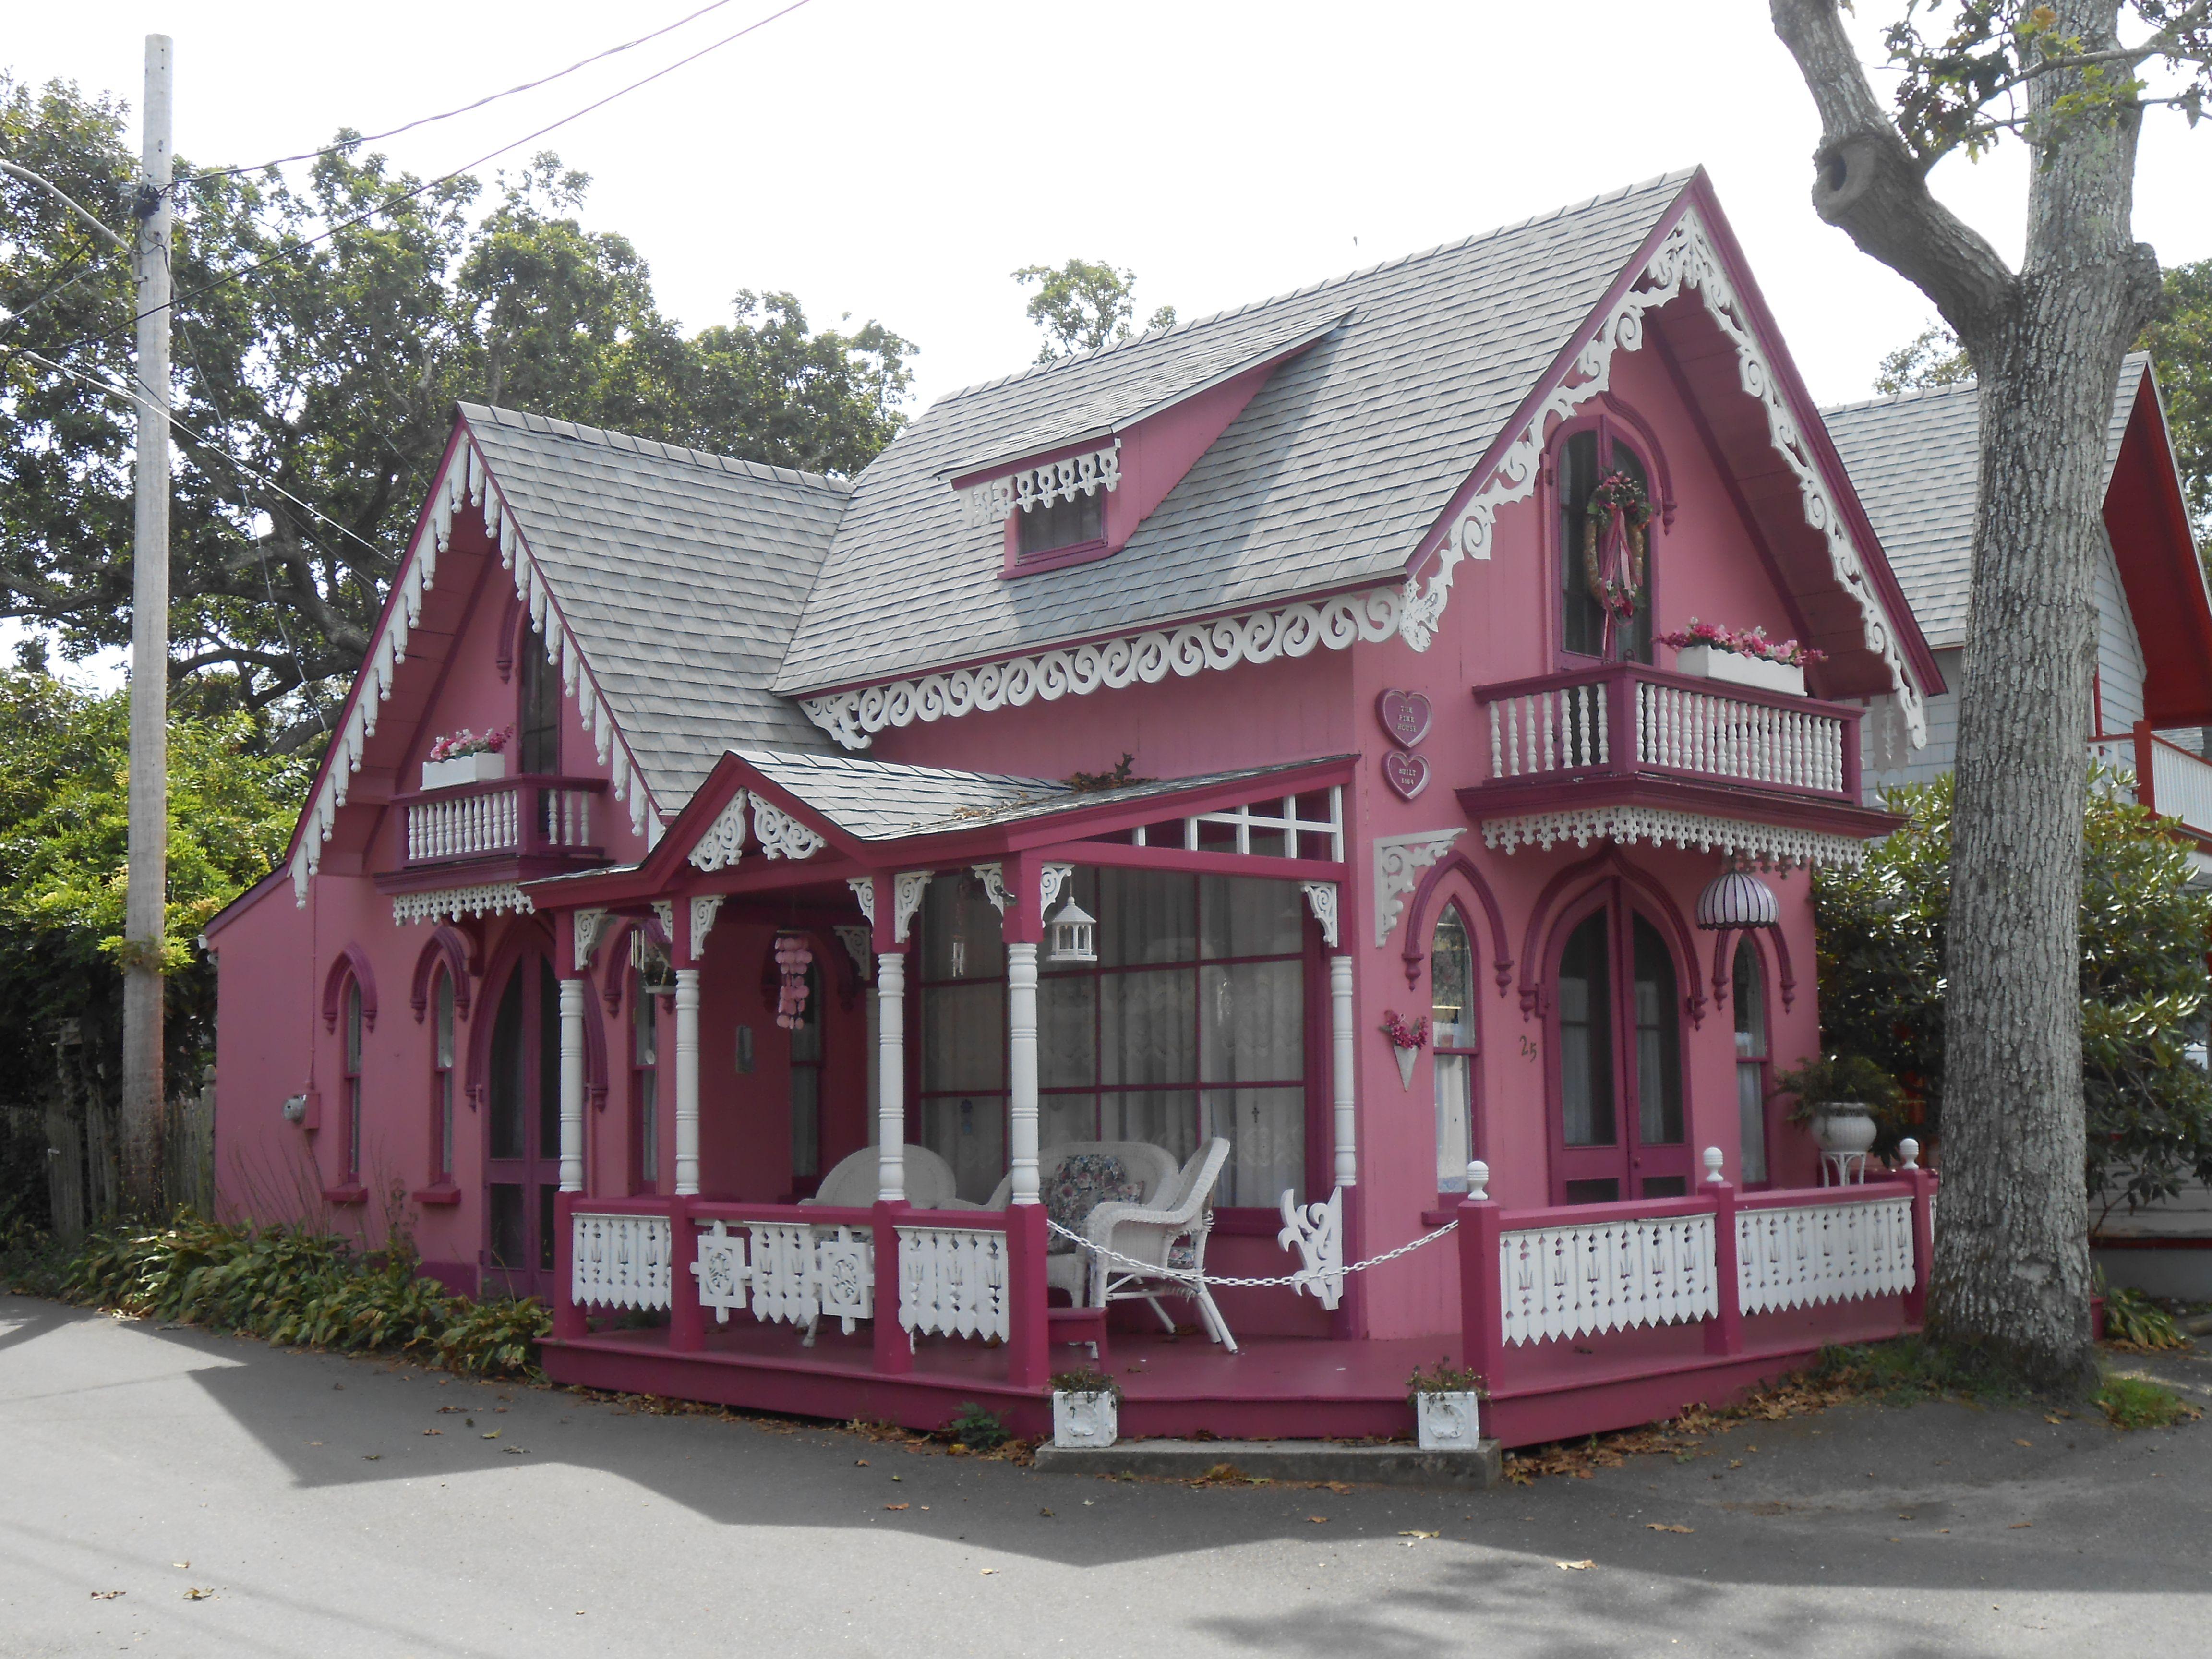 Gingerbread house on martha 39 s vineyard houses martha 39 s for Gingerbread houses martha s vineyard